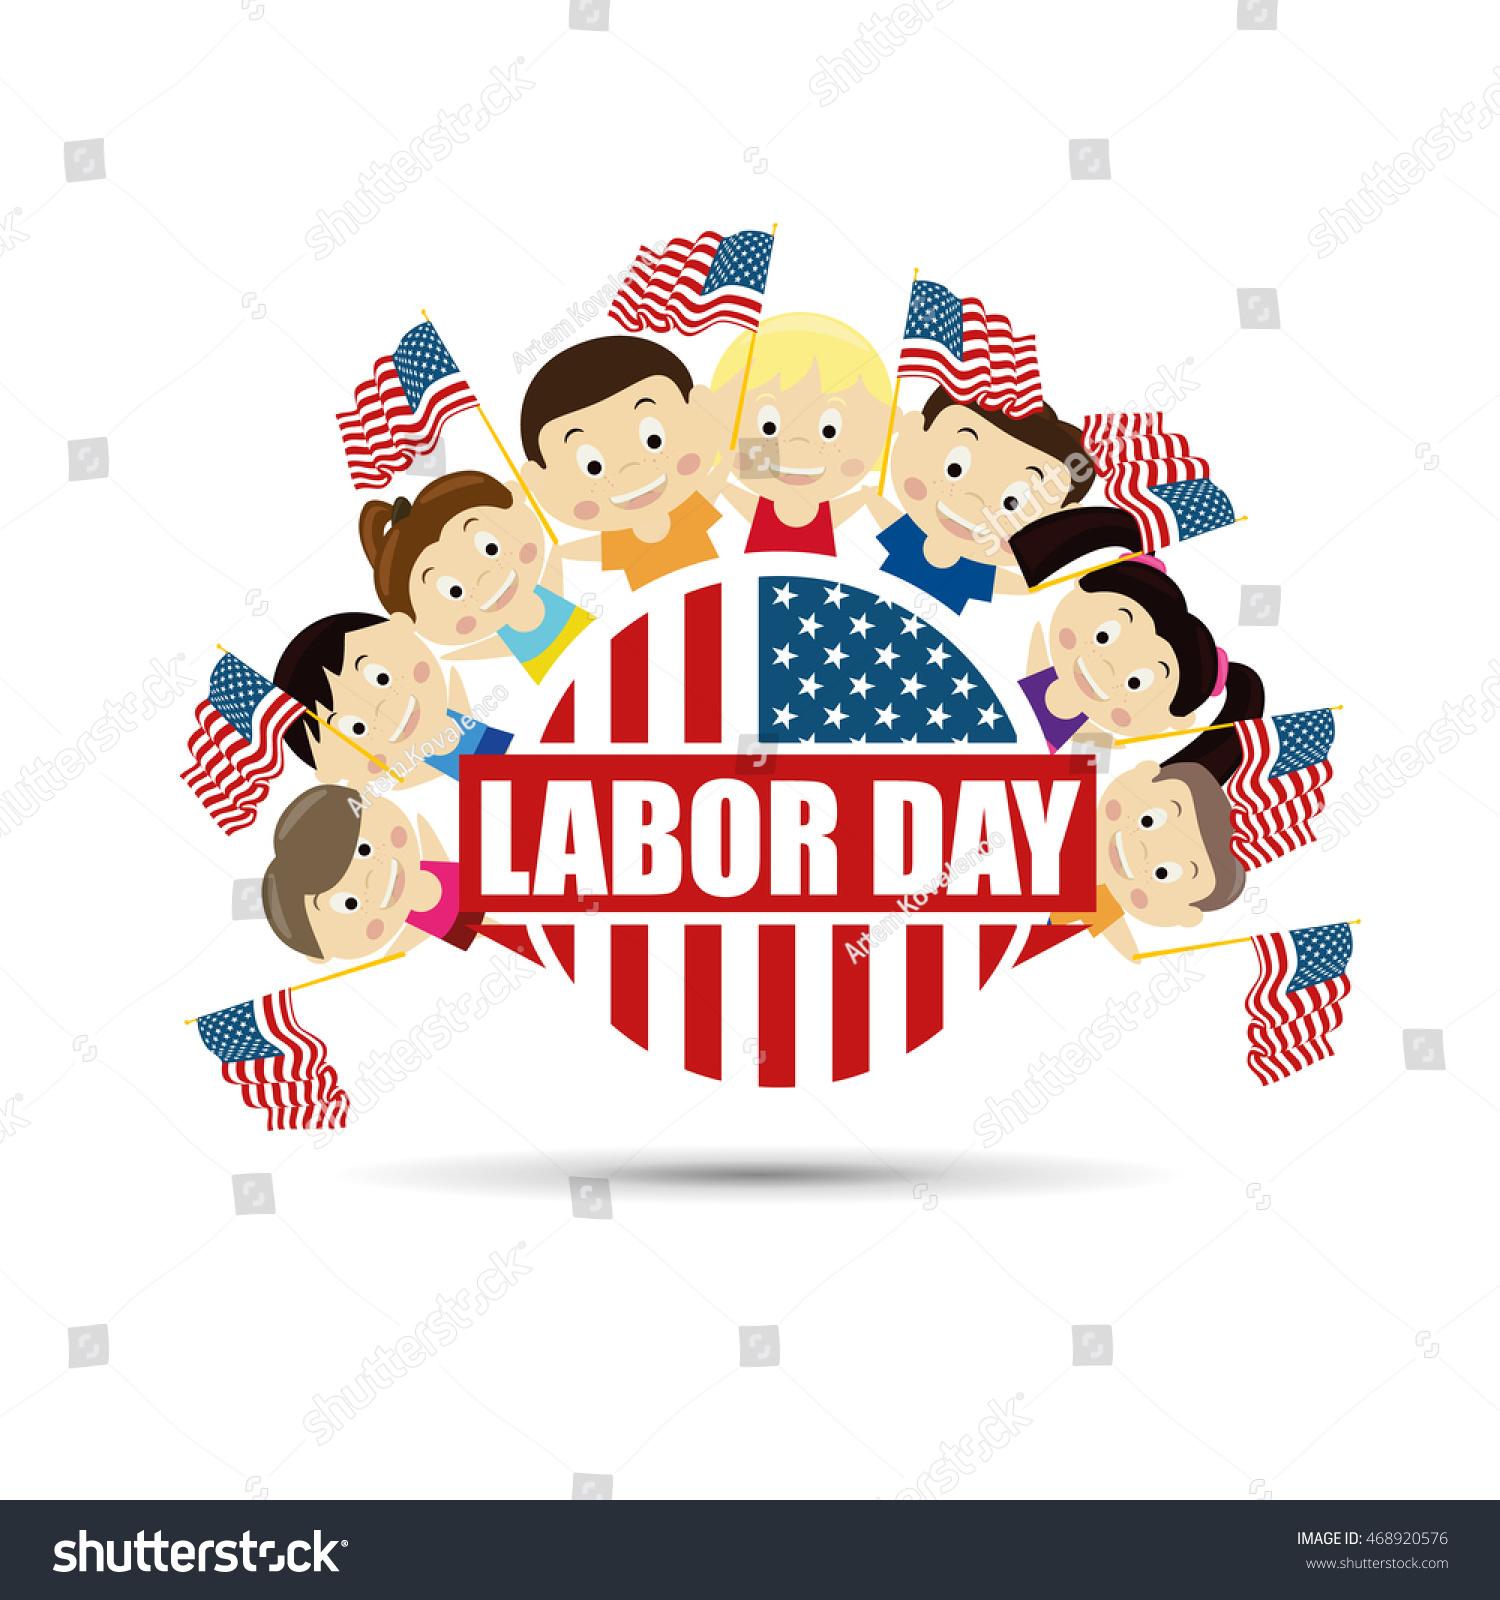 Vector Illustration Labor Day National Holiday เวกเตอร สต อก ปลอด